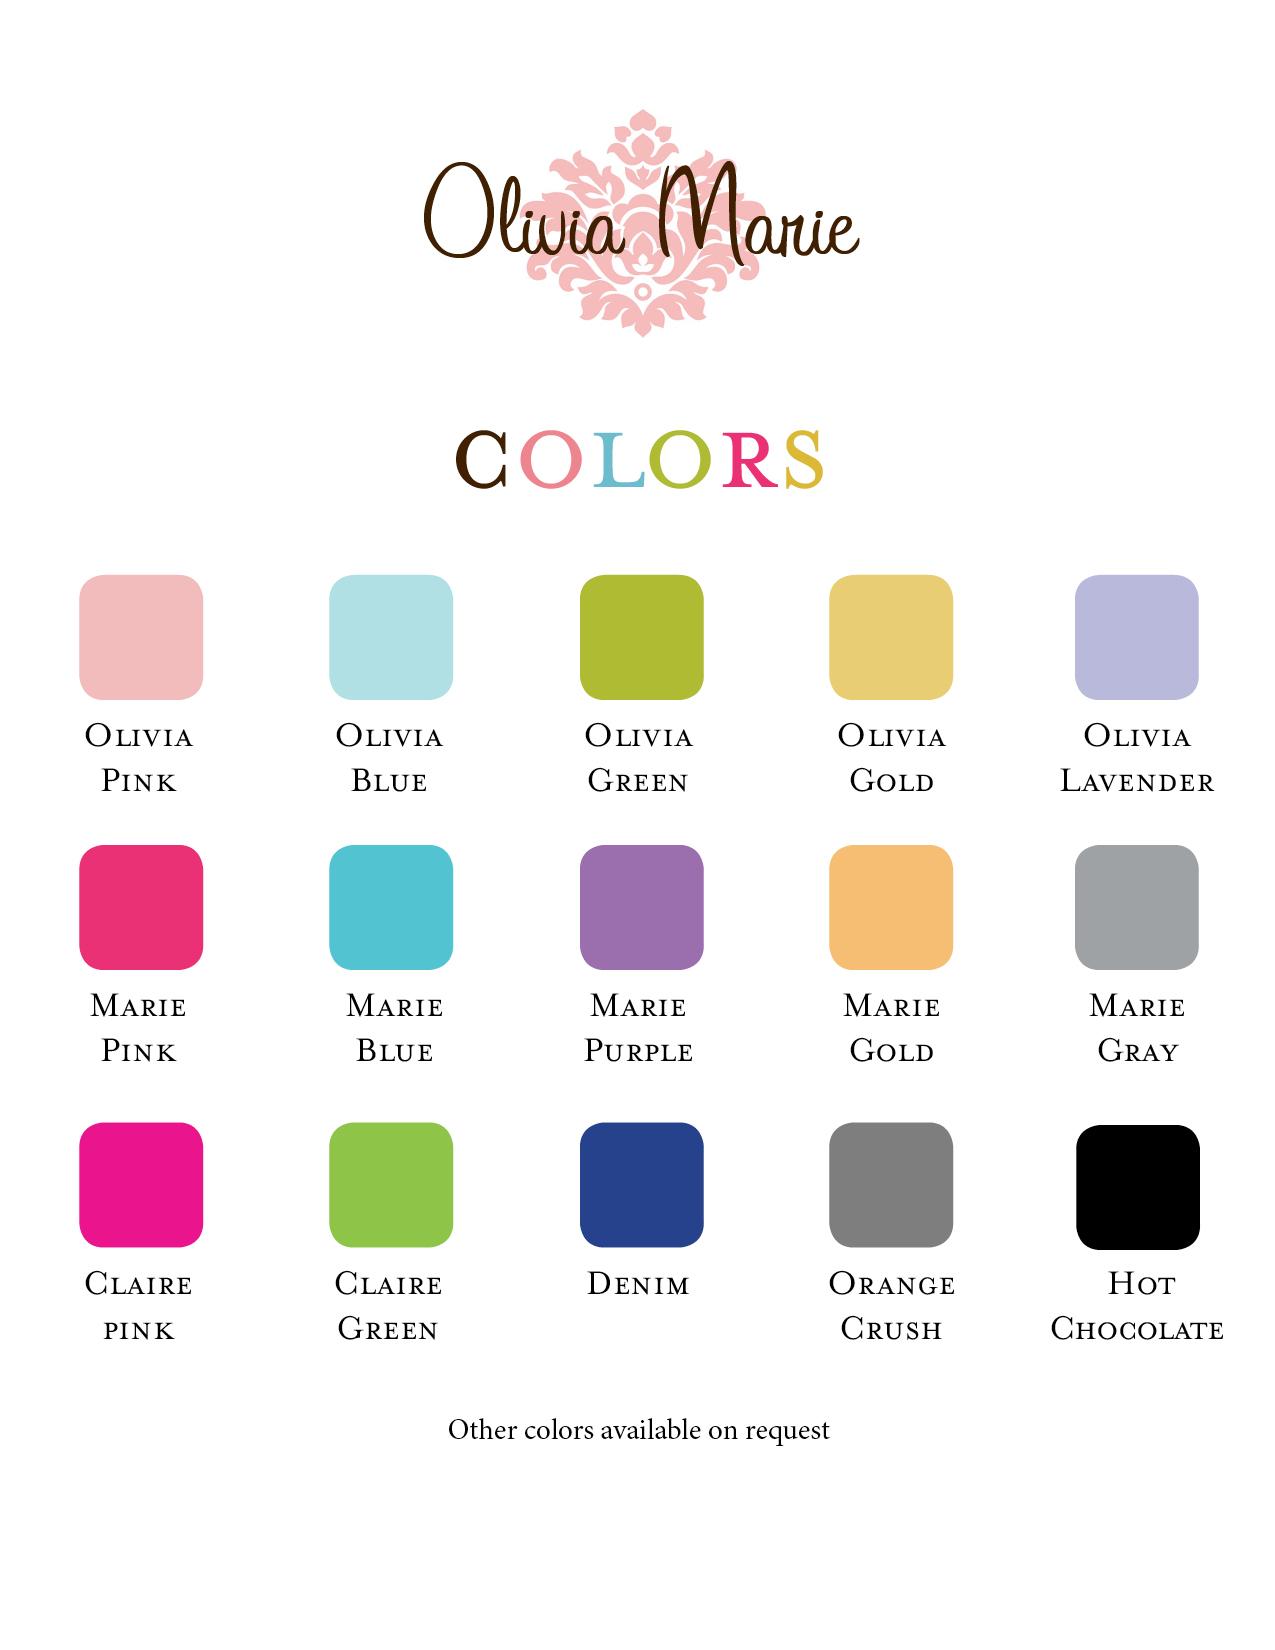 Olivia Marie Colors - Classic .jpg